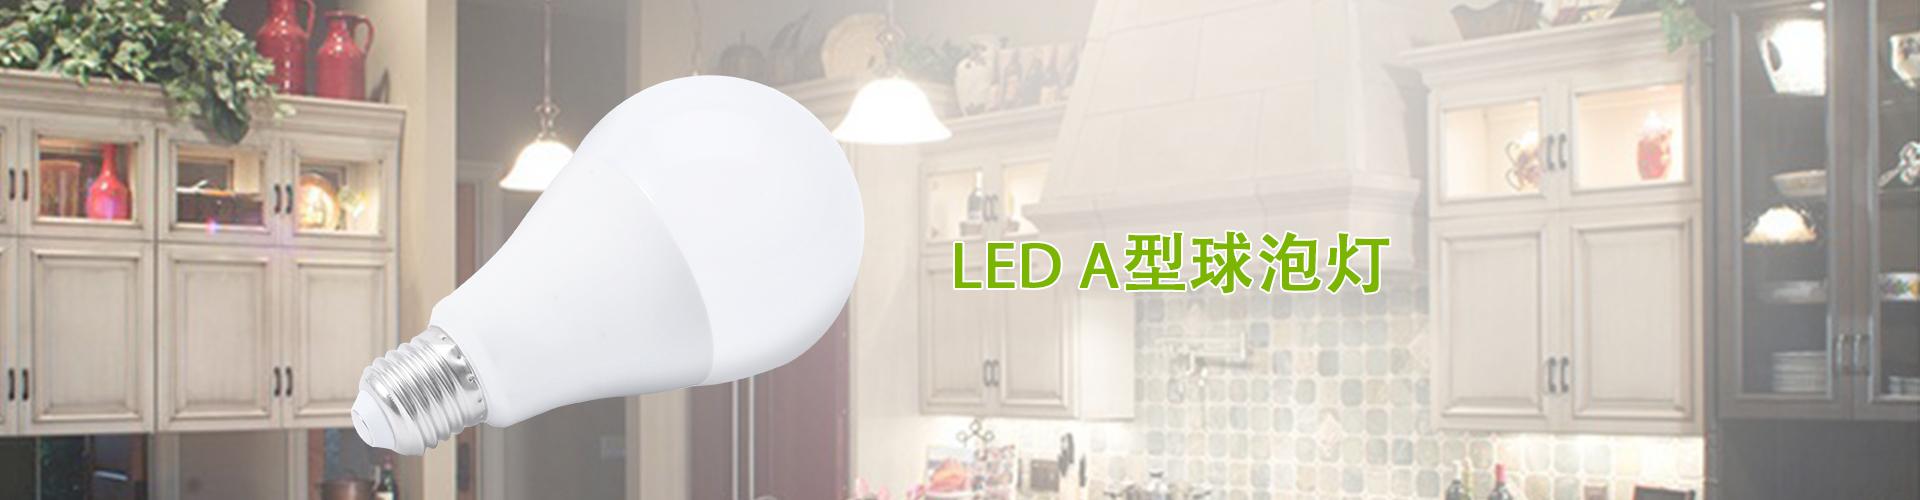 LED A型球泡灯